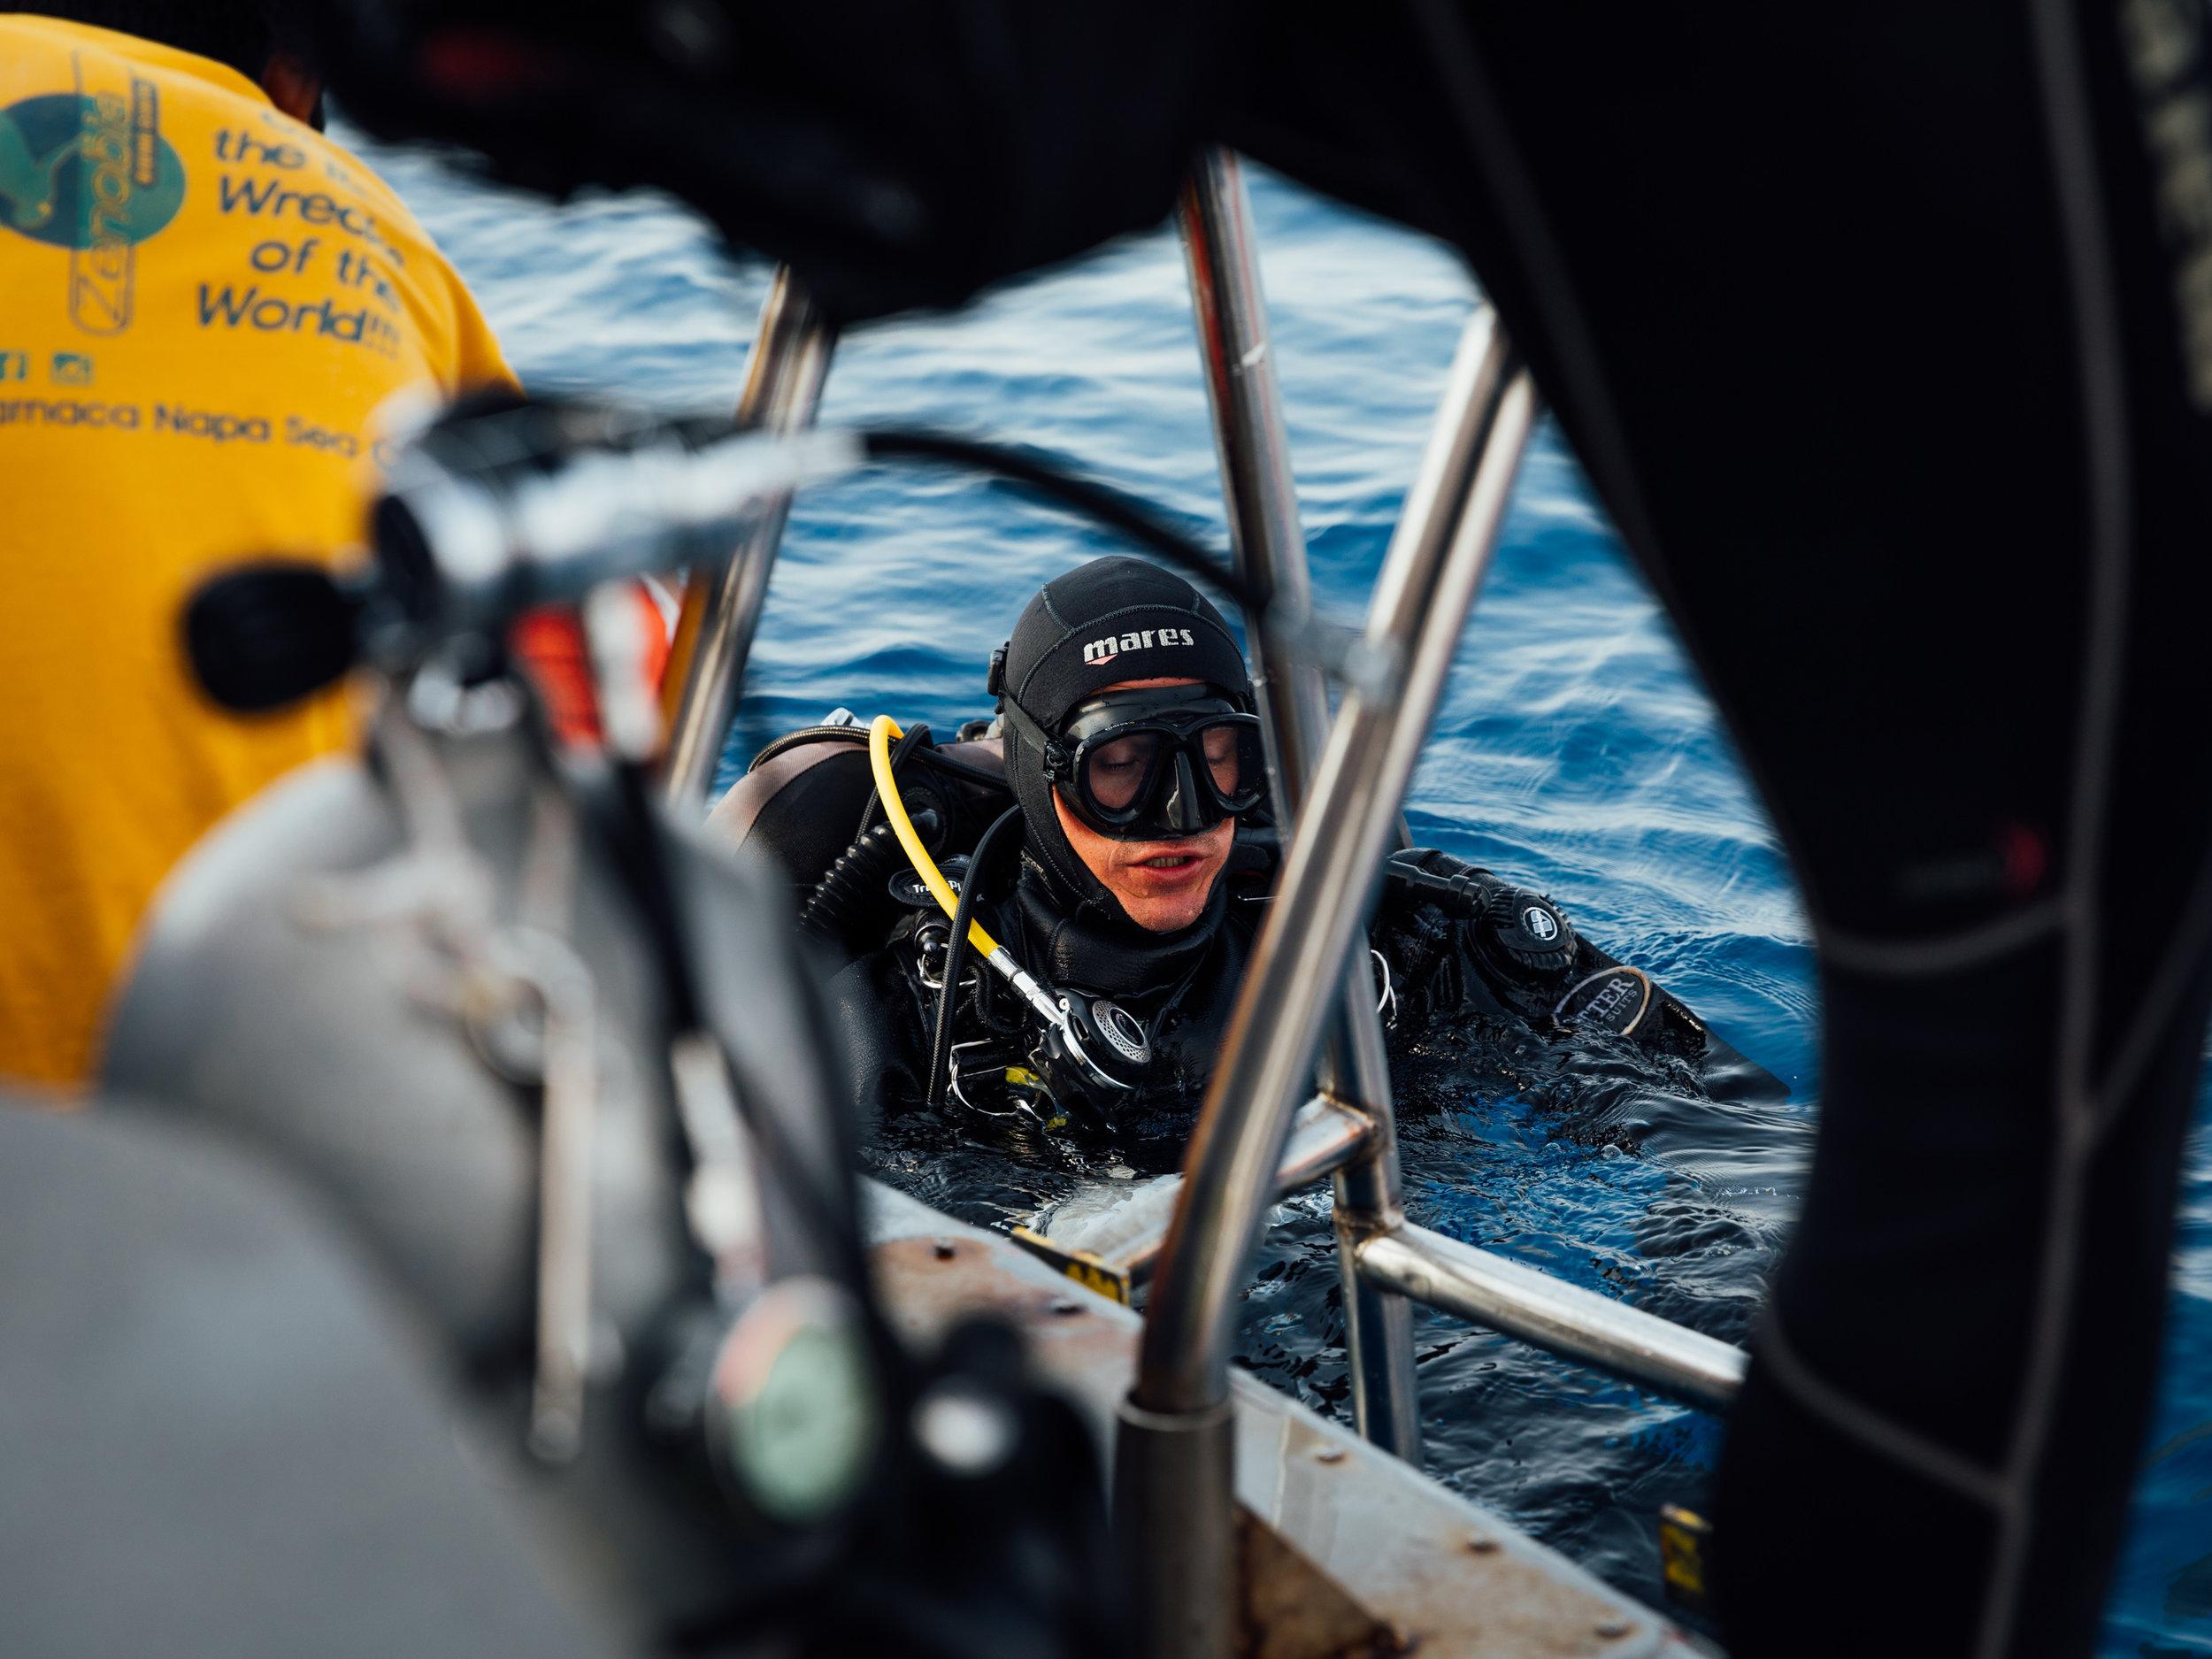 BenReadPhotography_TUI-Flyjournal-Diving-10.jpg